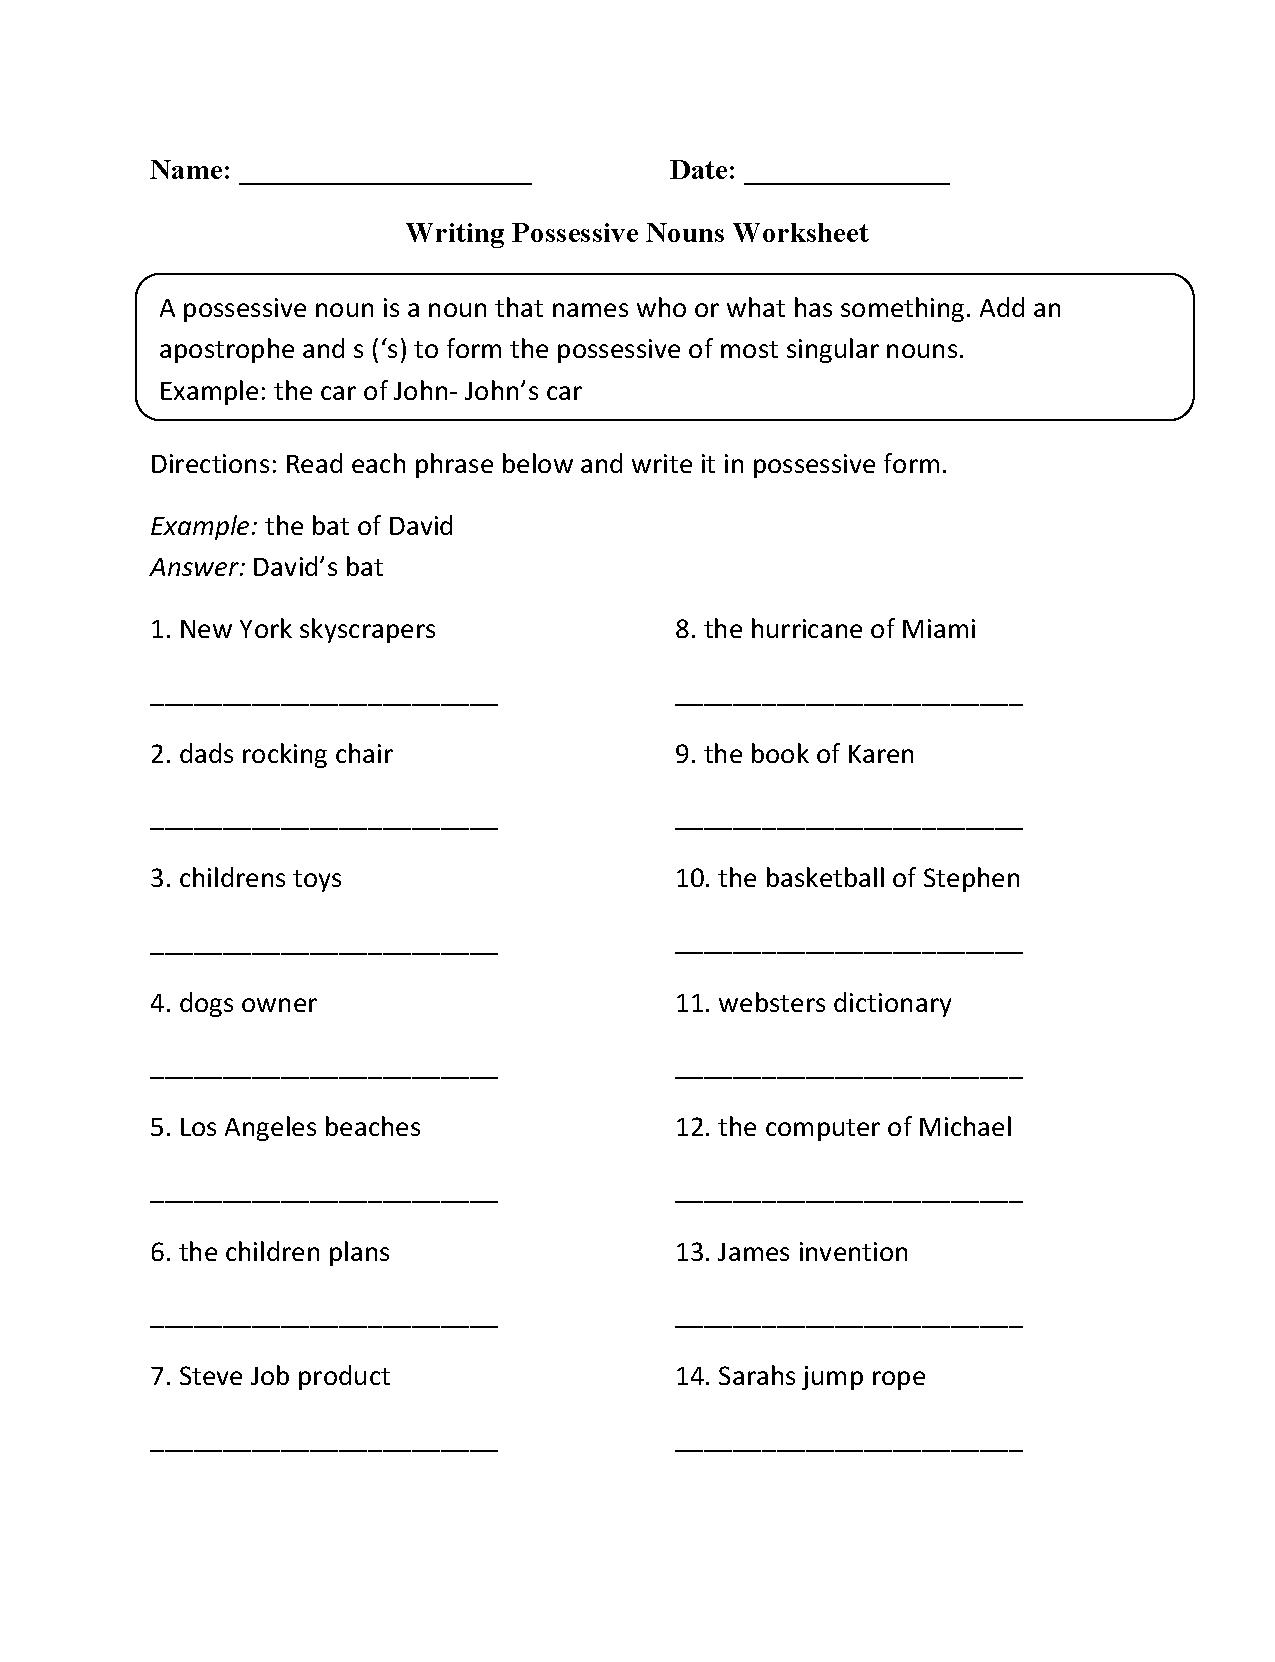 Worksheets On Possessive Nouns The Best Worksheets Image